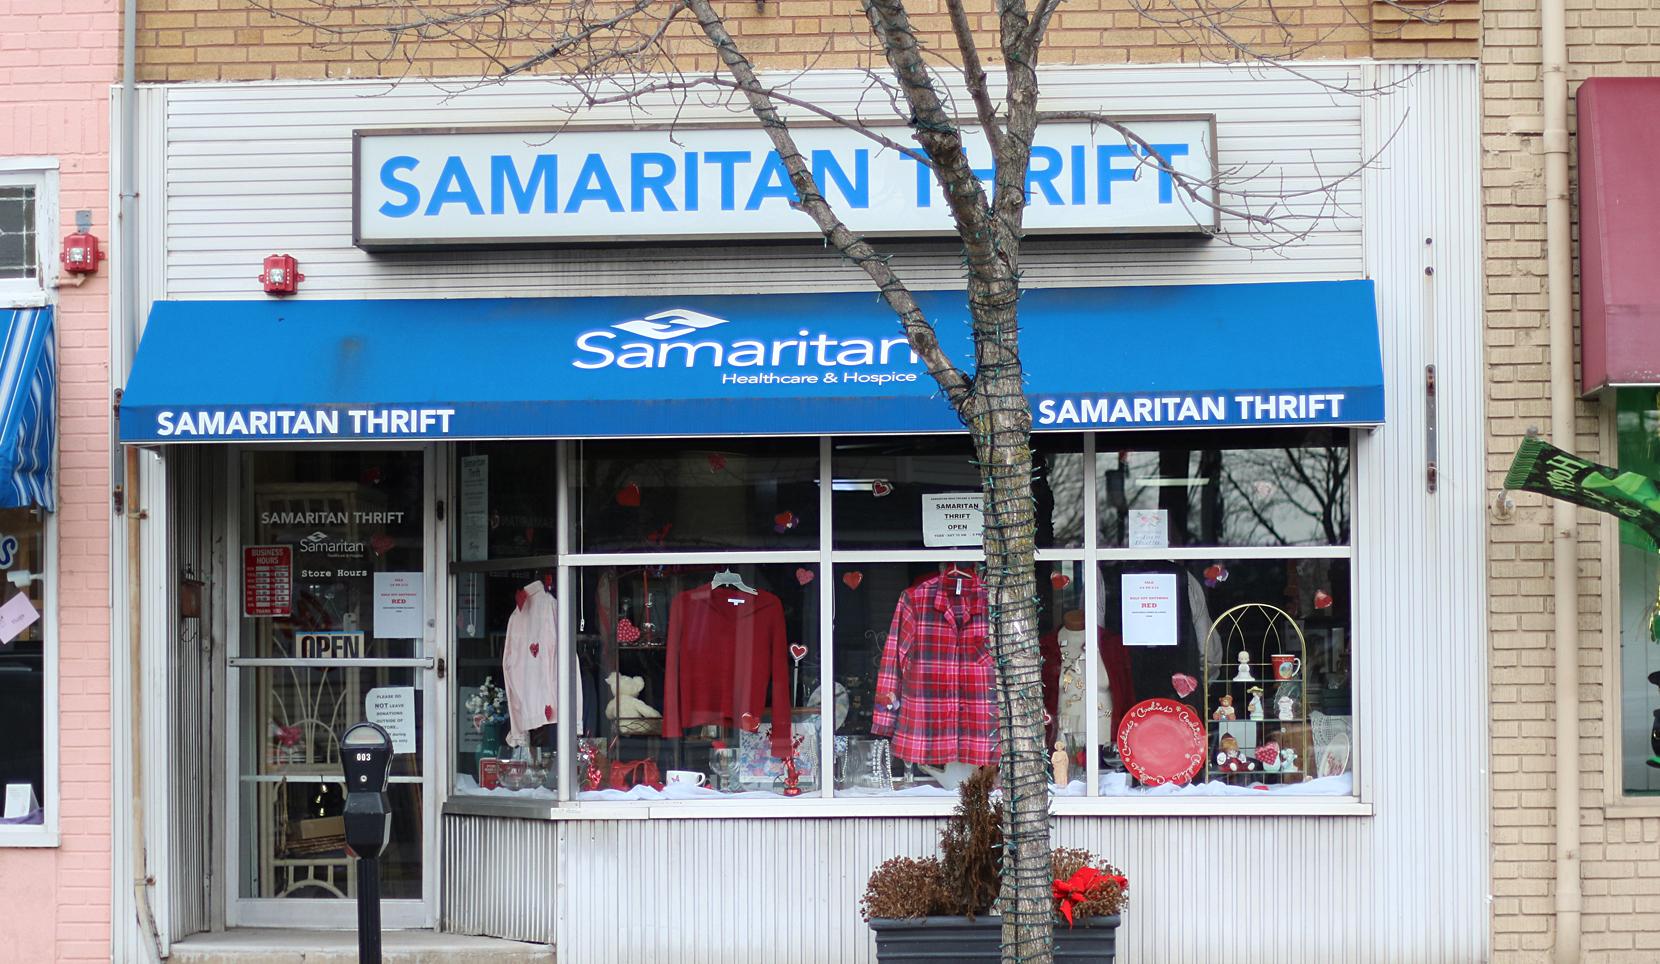 samaritan thrift